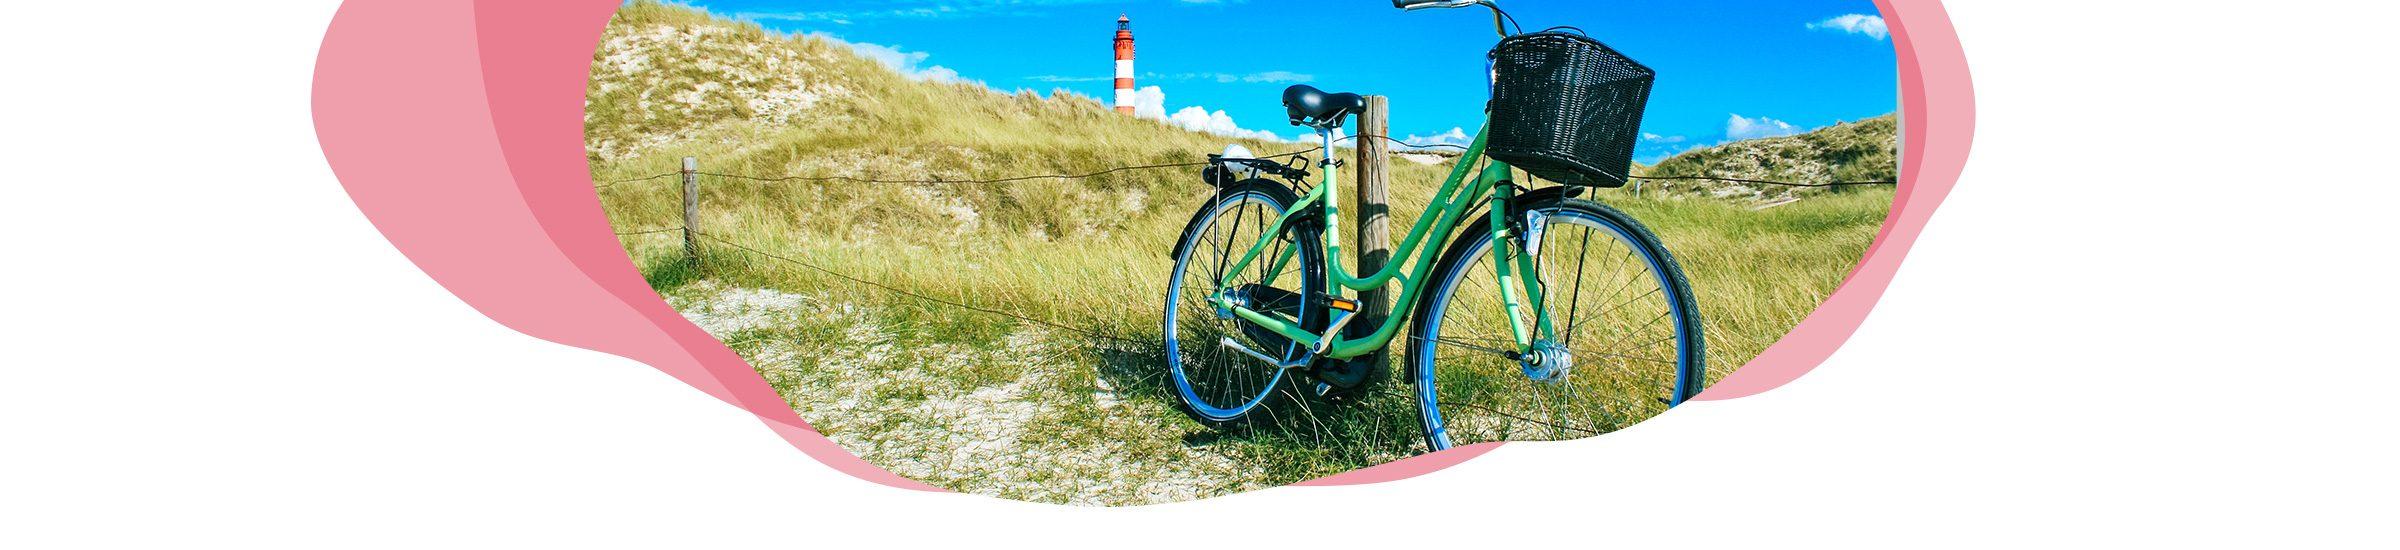 Fahrradtour Header-Image